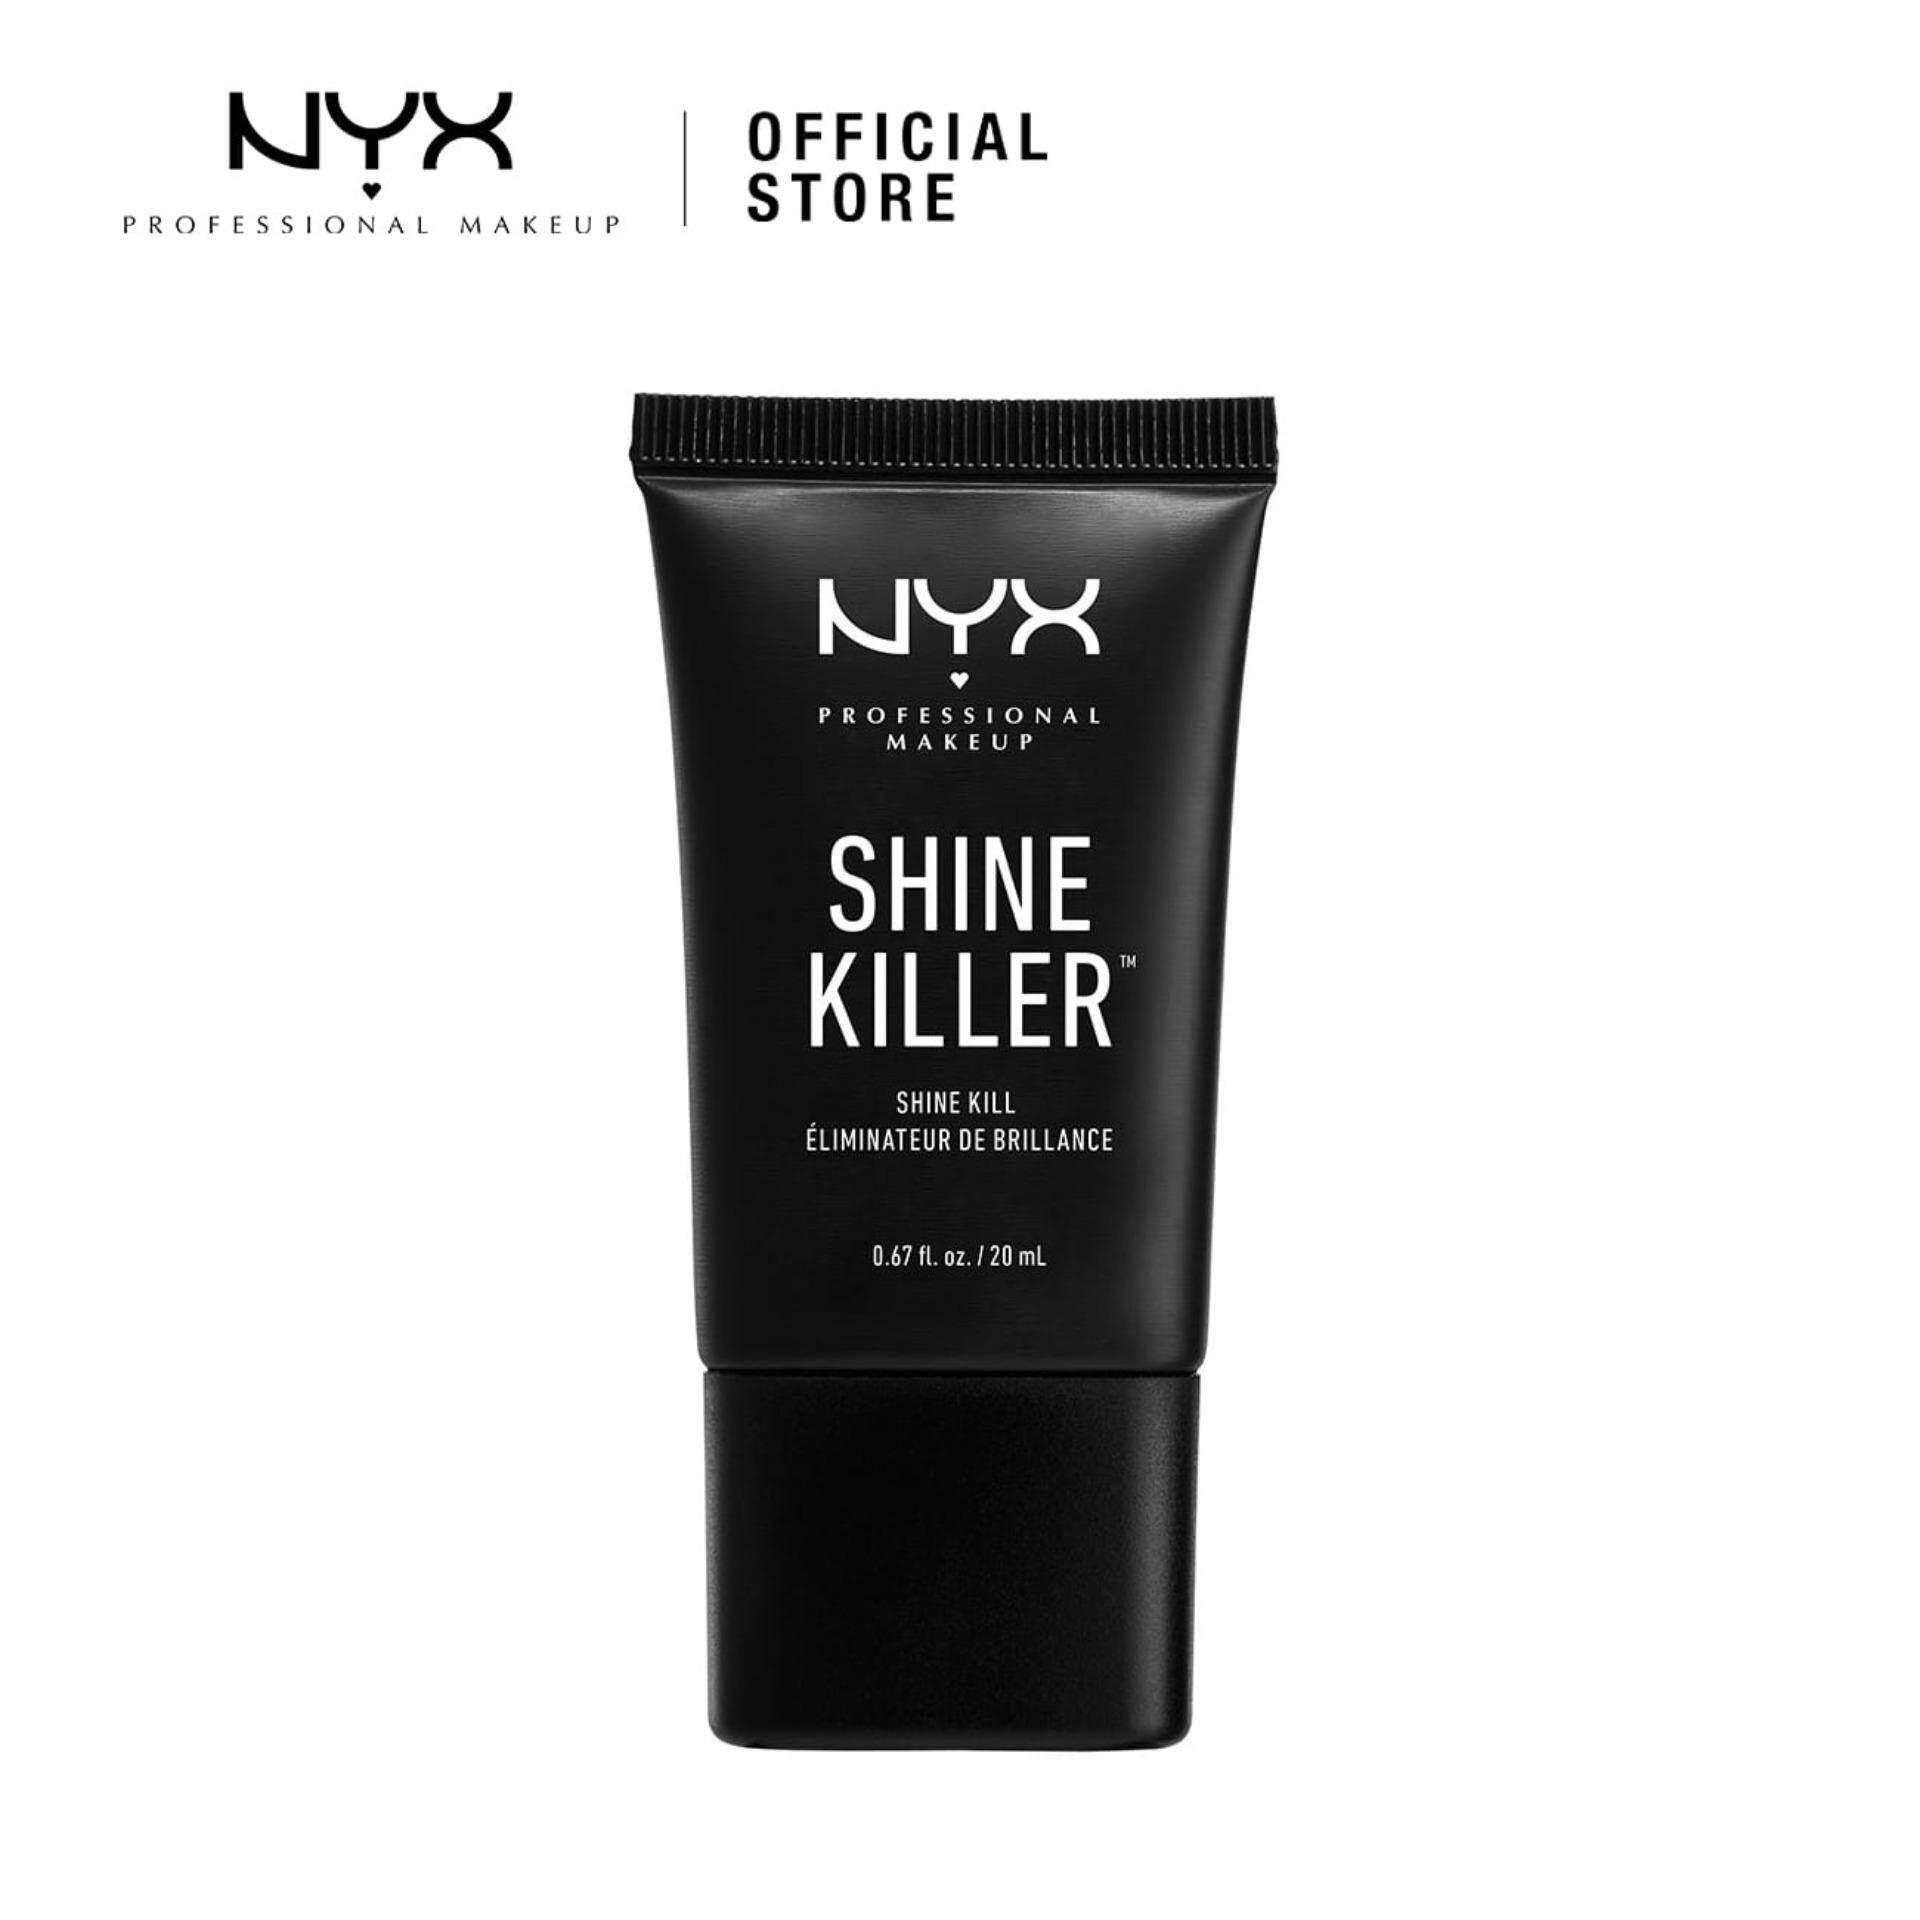 NYX PROFESSIONAL MAKEUP Shine Killer